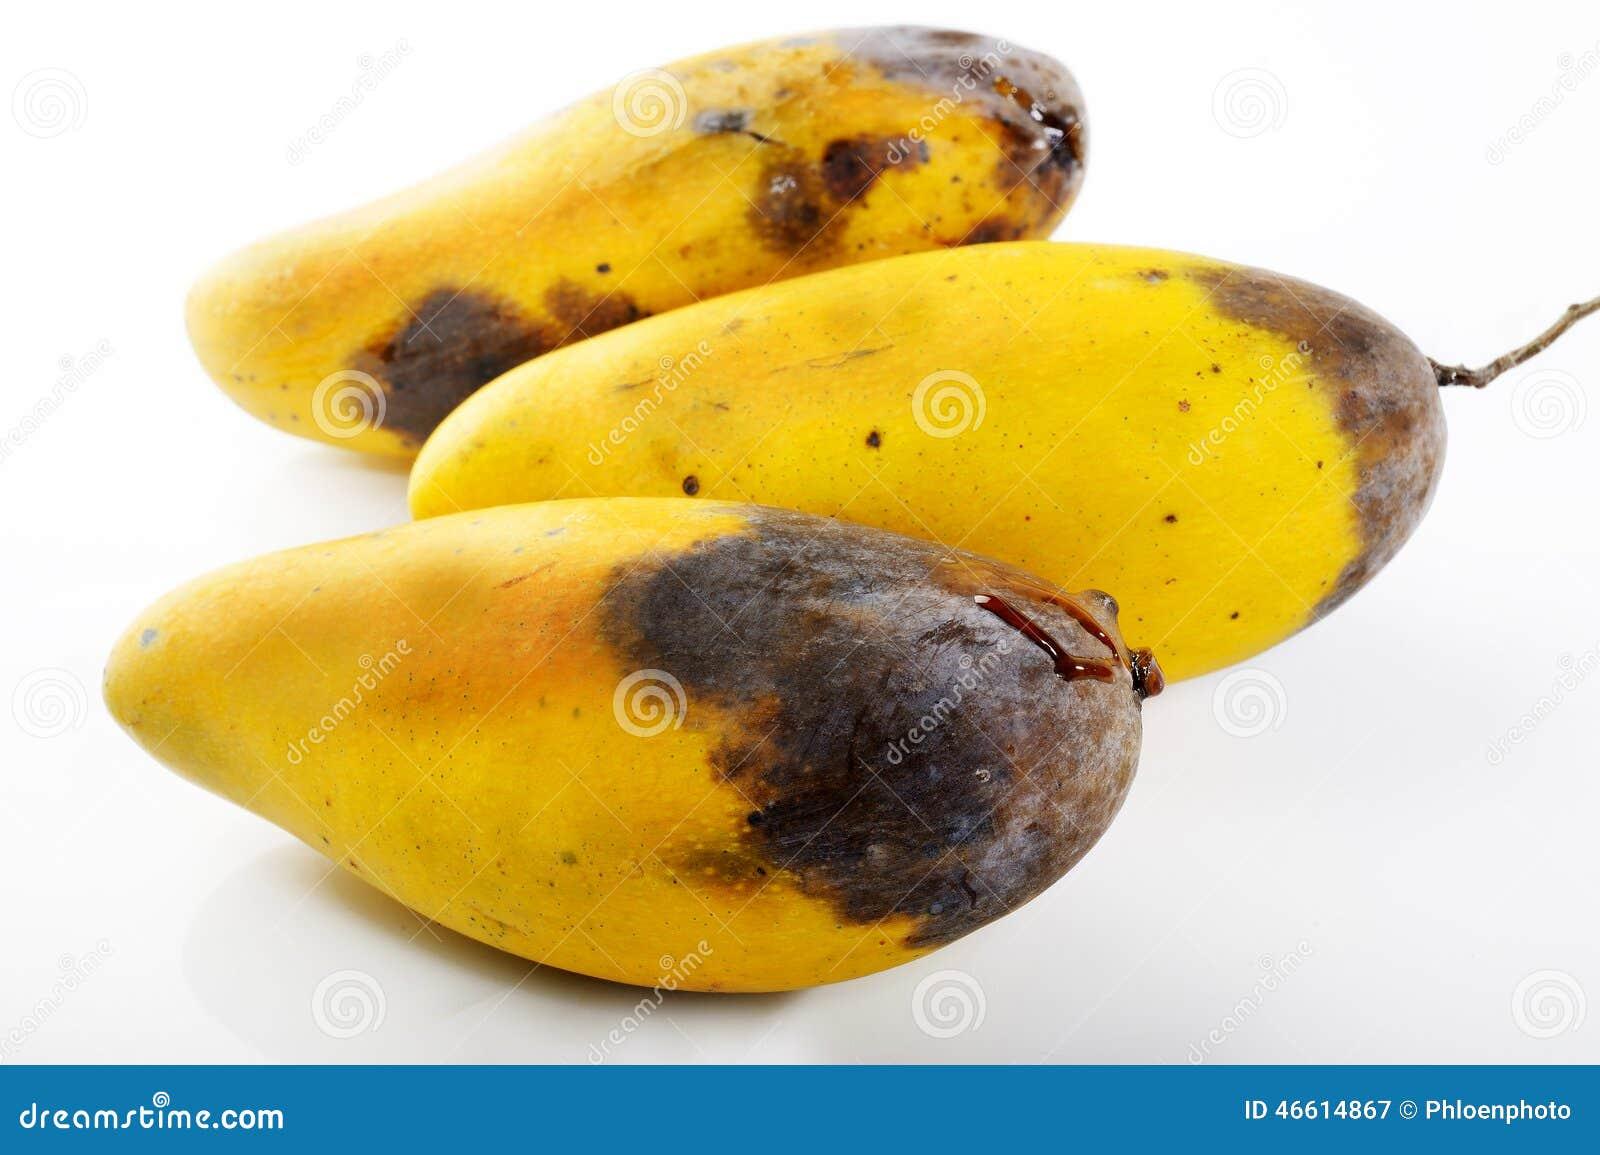 Natural Yellow Skin